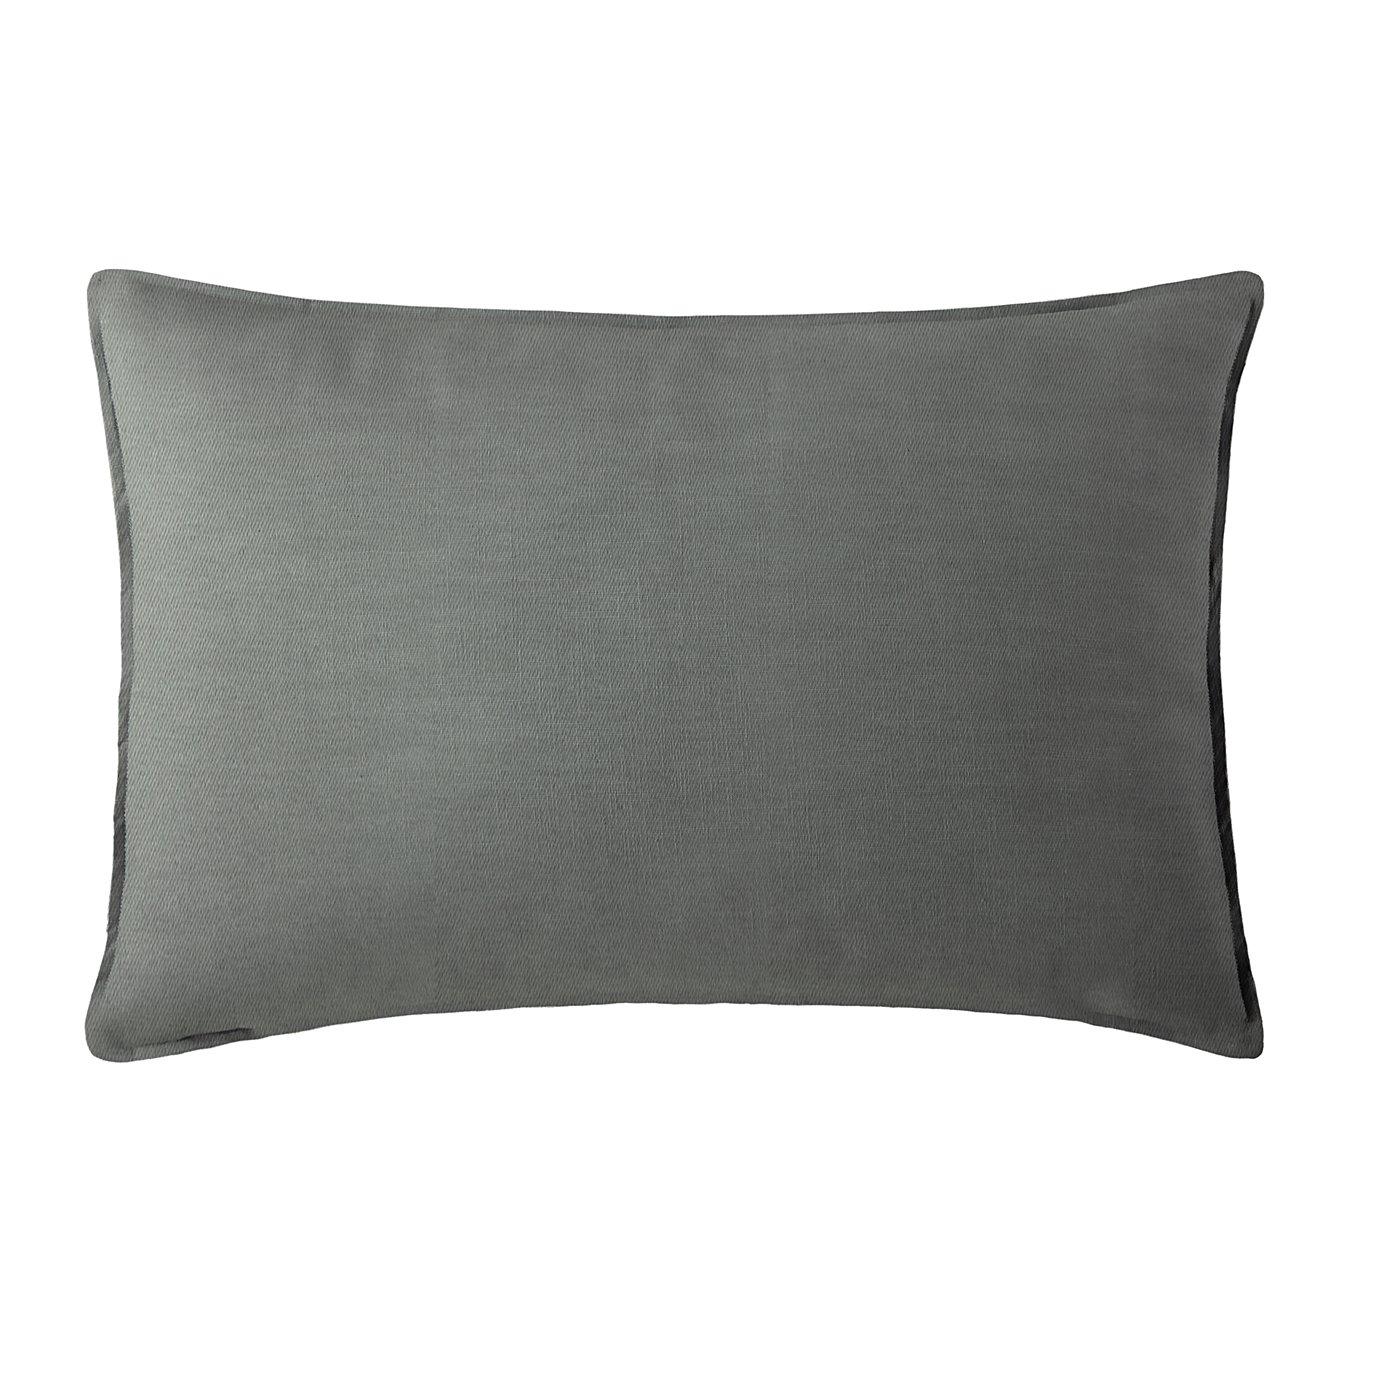 Harrow Charcoal Pillow Sham King